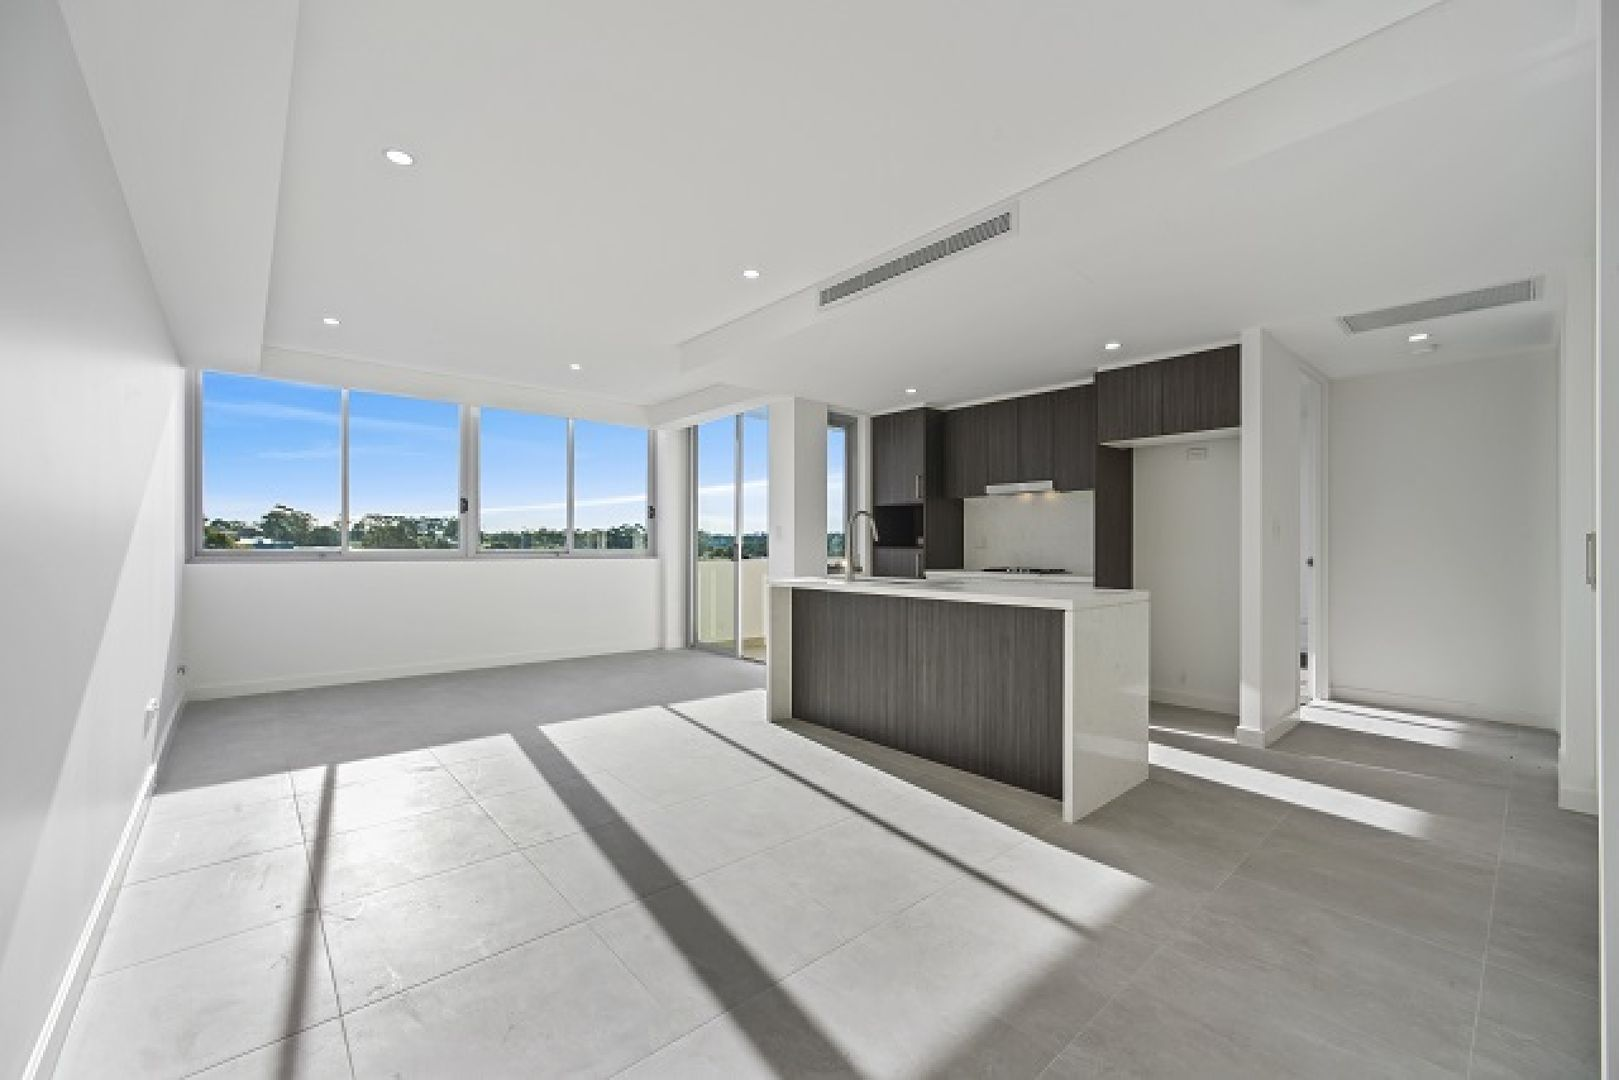 204/8 Monash Road, Gladesville NSW 2111, Image 0